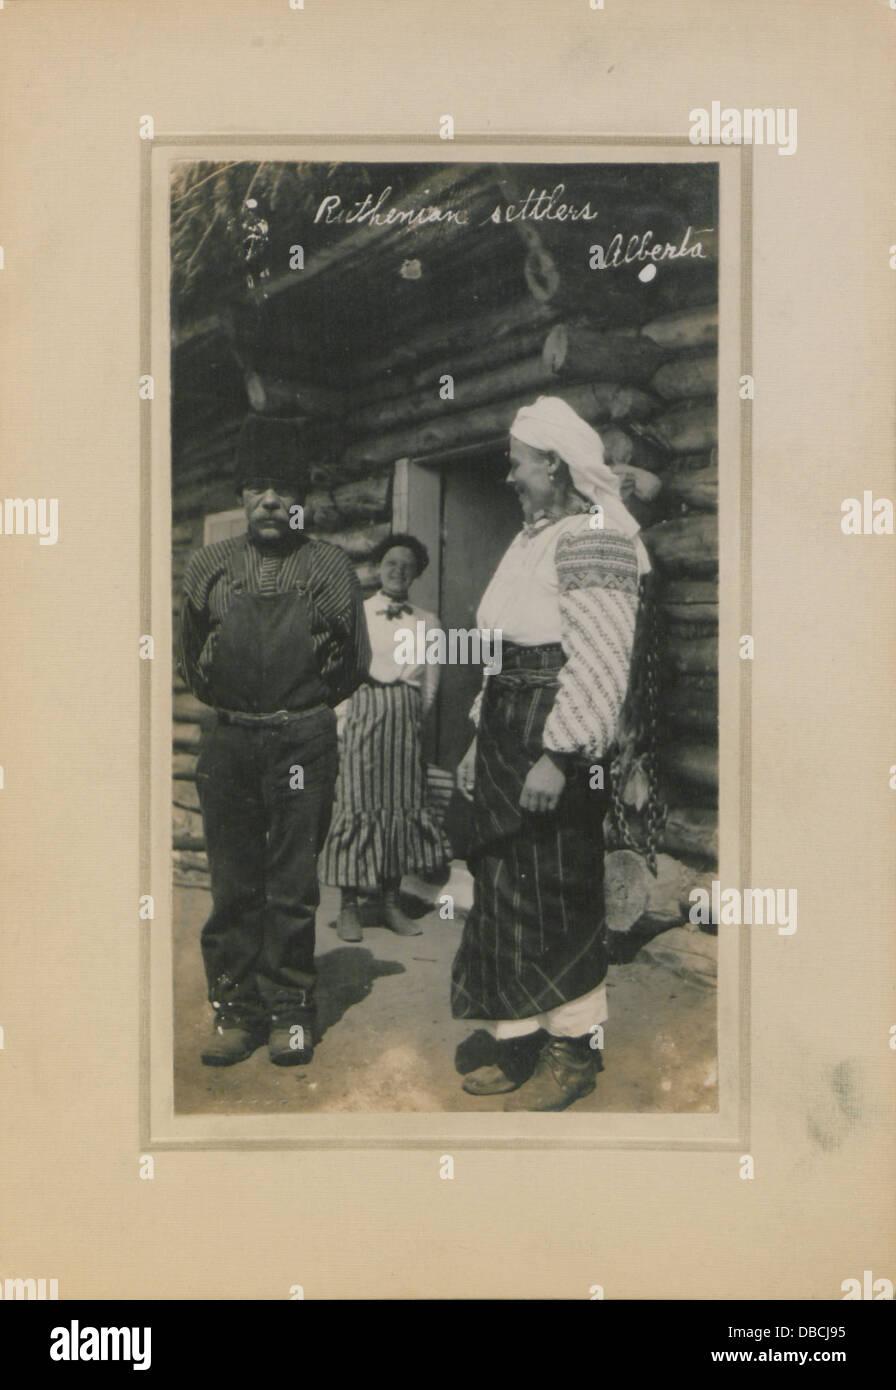 Les colons ruthène, Alberta (HS85-10-23670) Banque D'Images